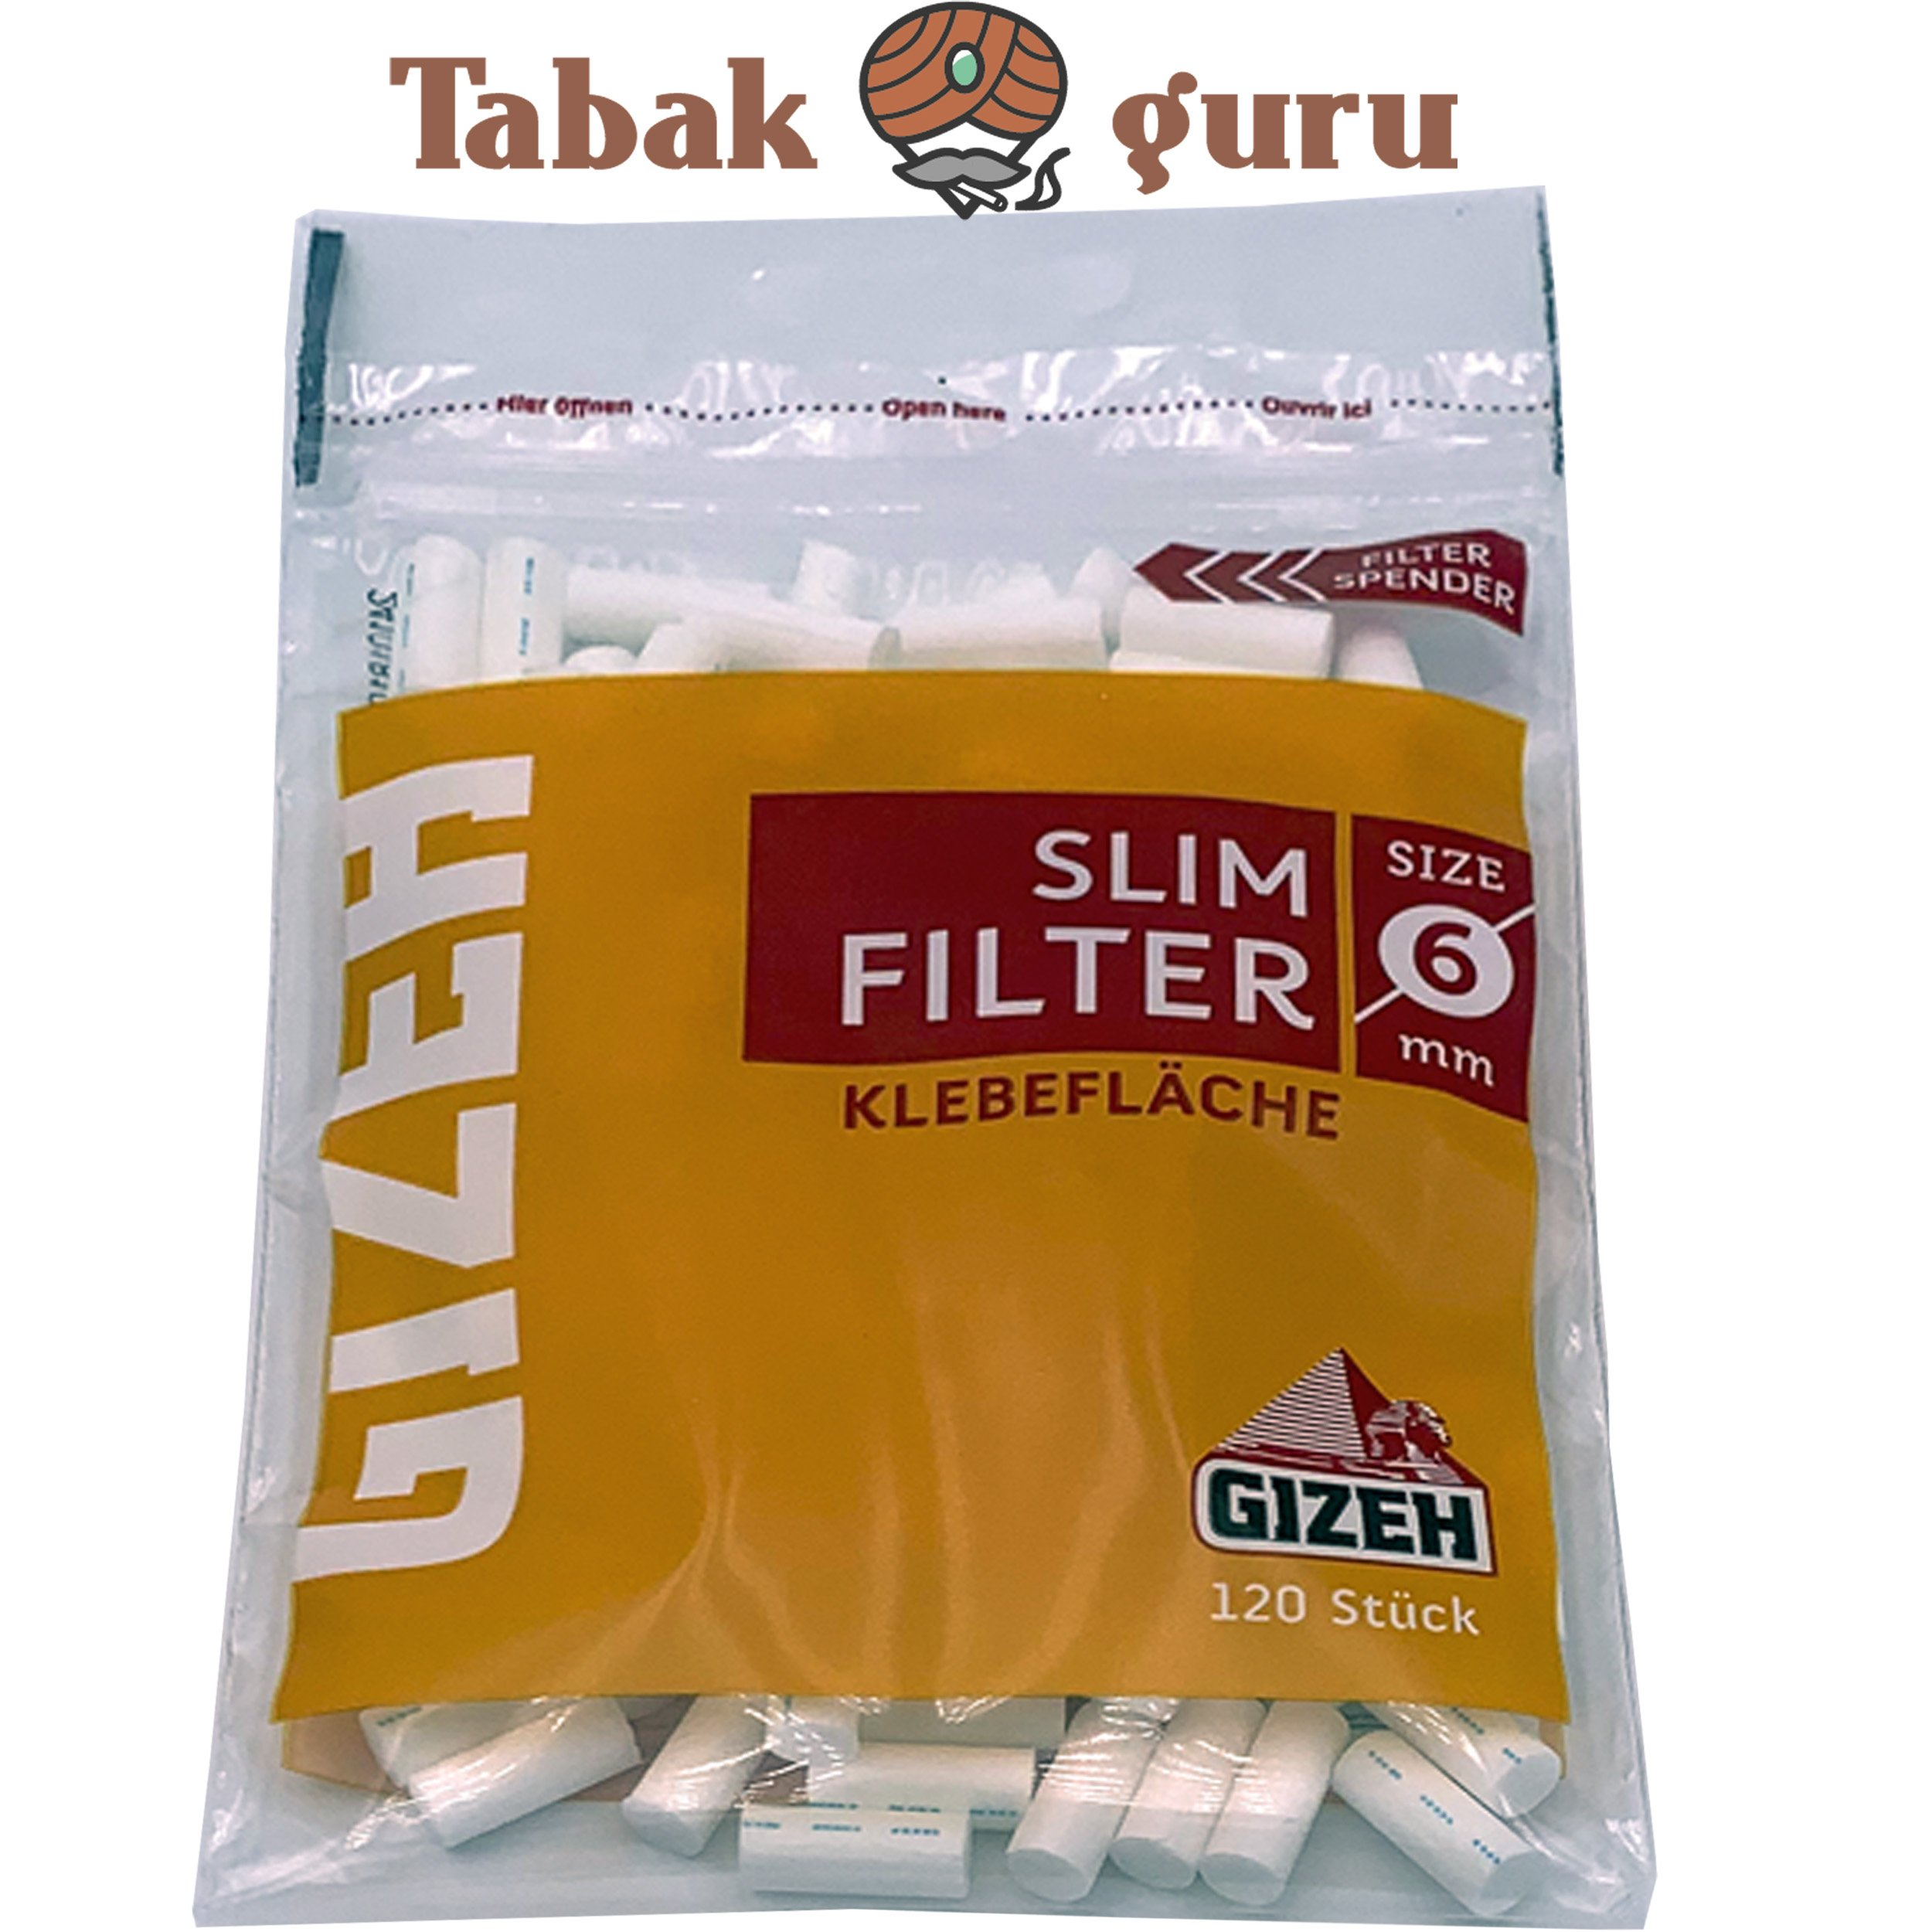 Gizeh Slim Filter 1 Päckchen a 120 Filter